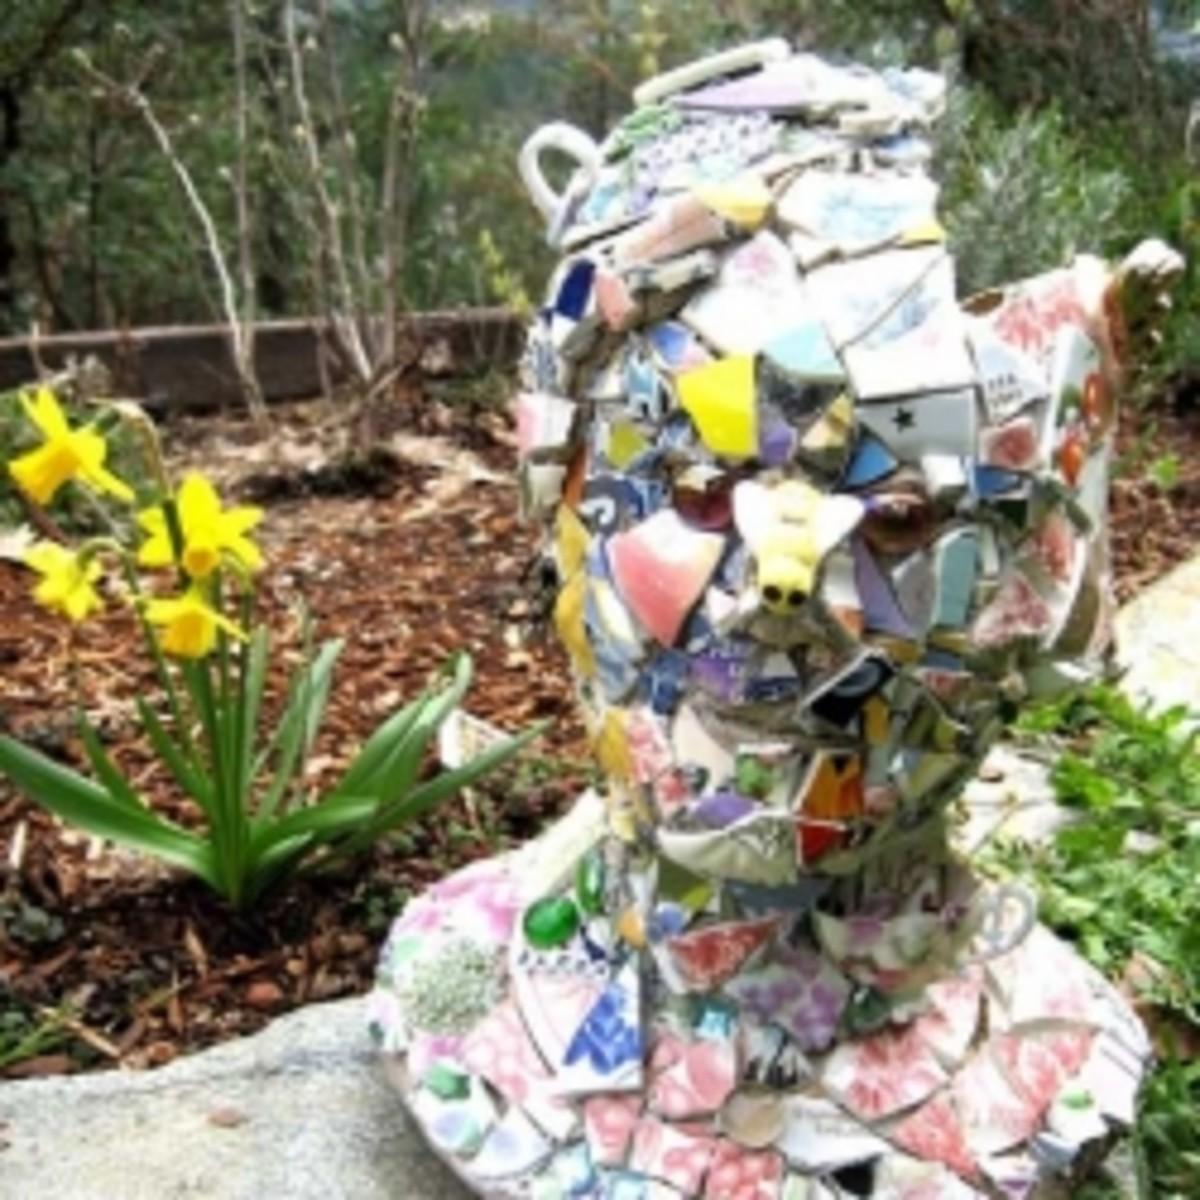 Concrete & Cement DIY Projects | Garden Crafts, Sculptures & Fun Makes